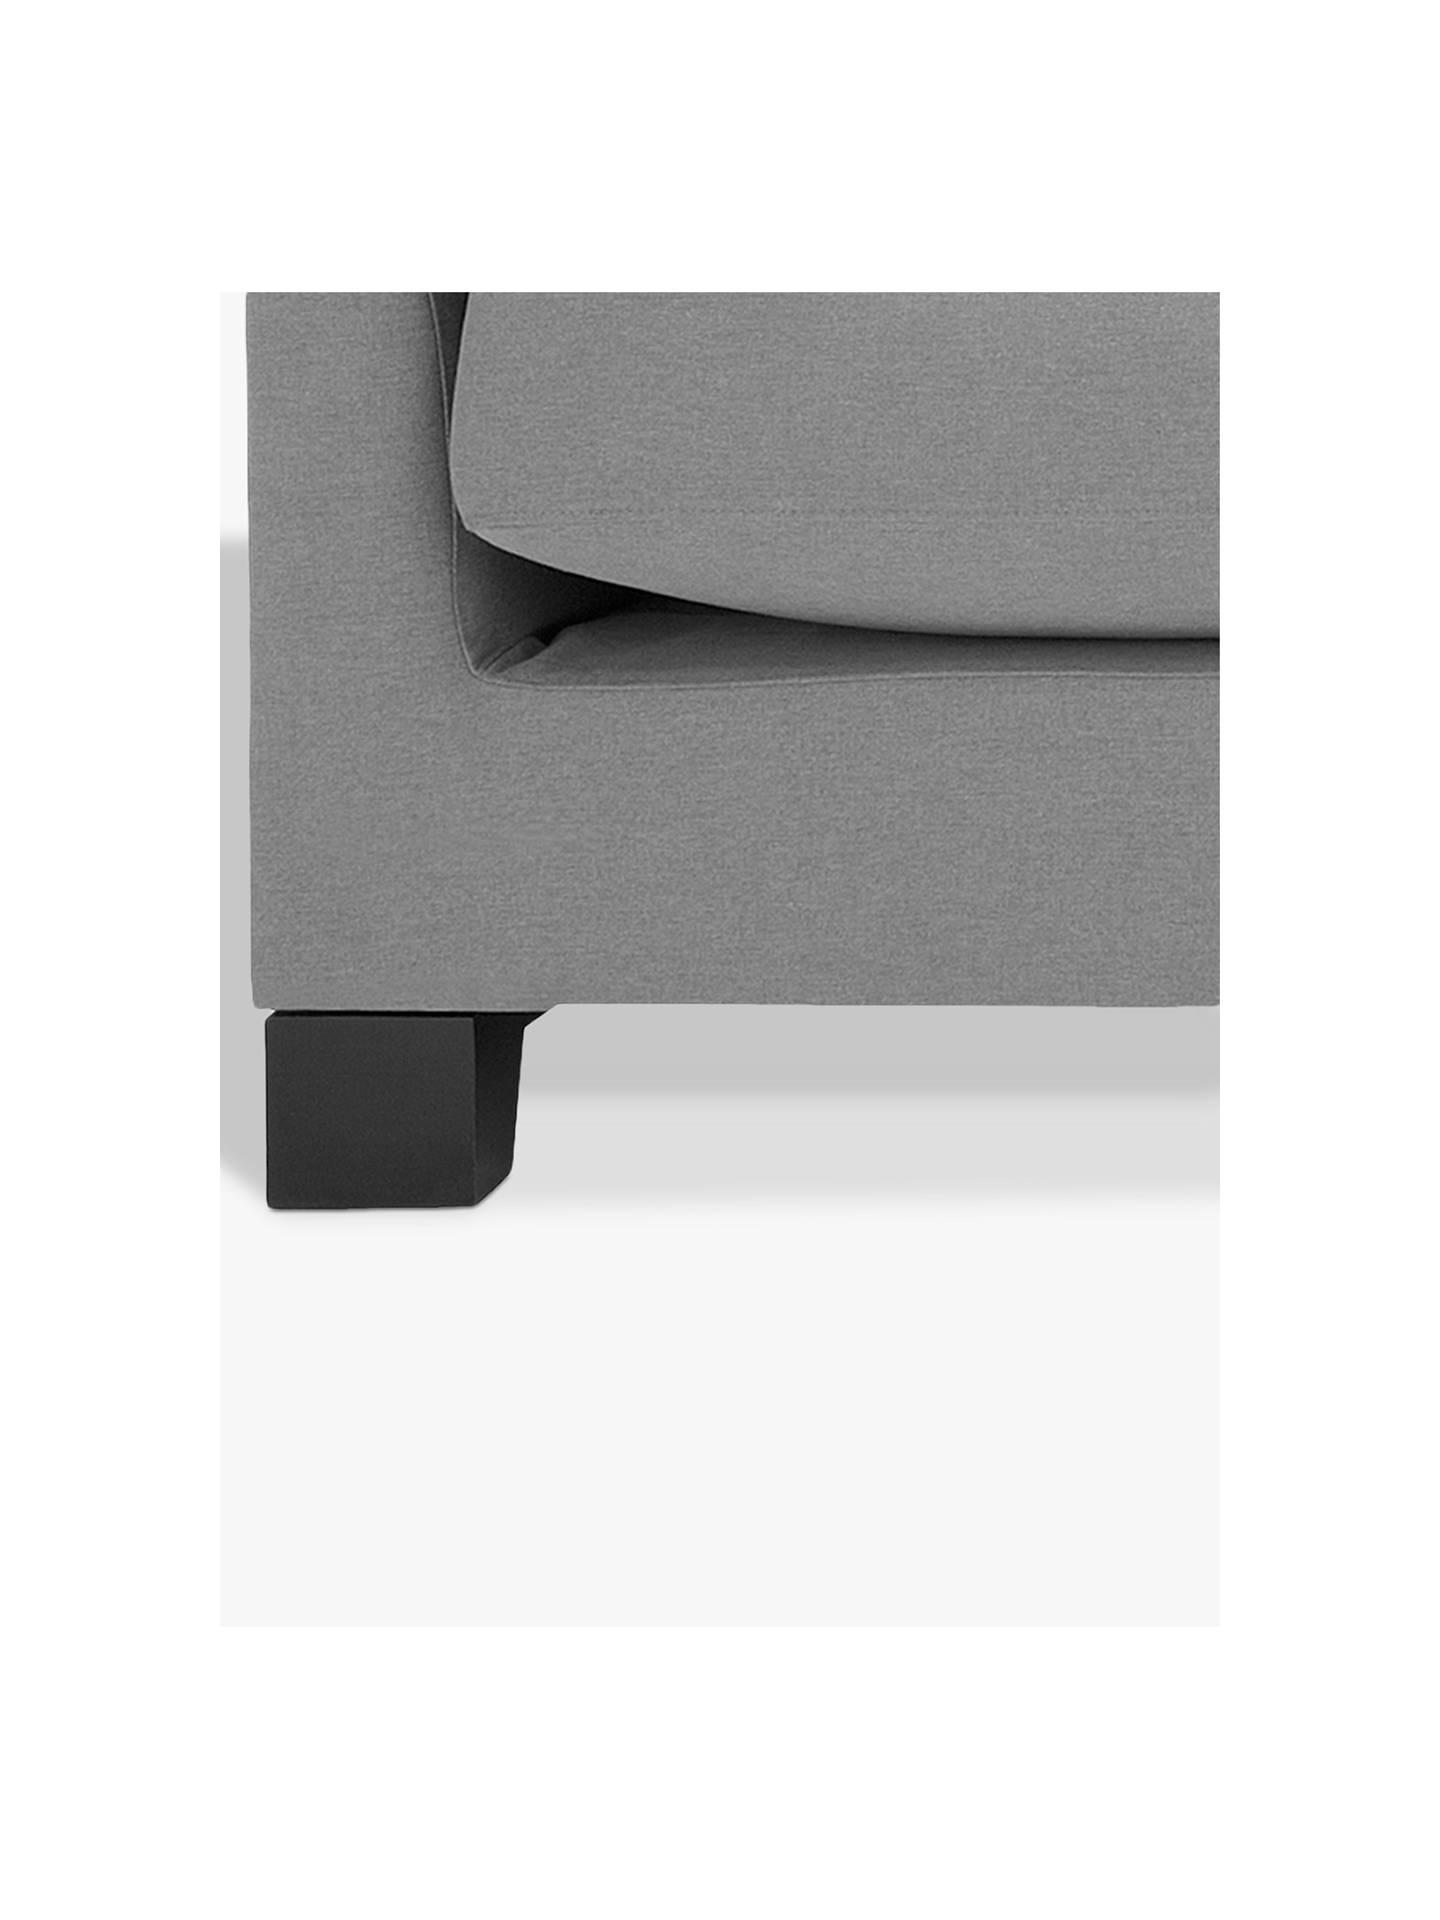 64d8b0e11 ... Buy John Lewis & Partners Ikon Grand 4 Seater Sofa Online at johnlewis.  ...